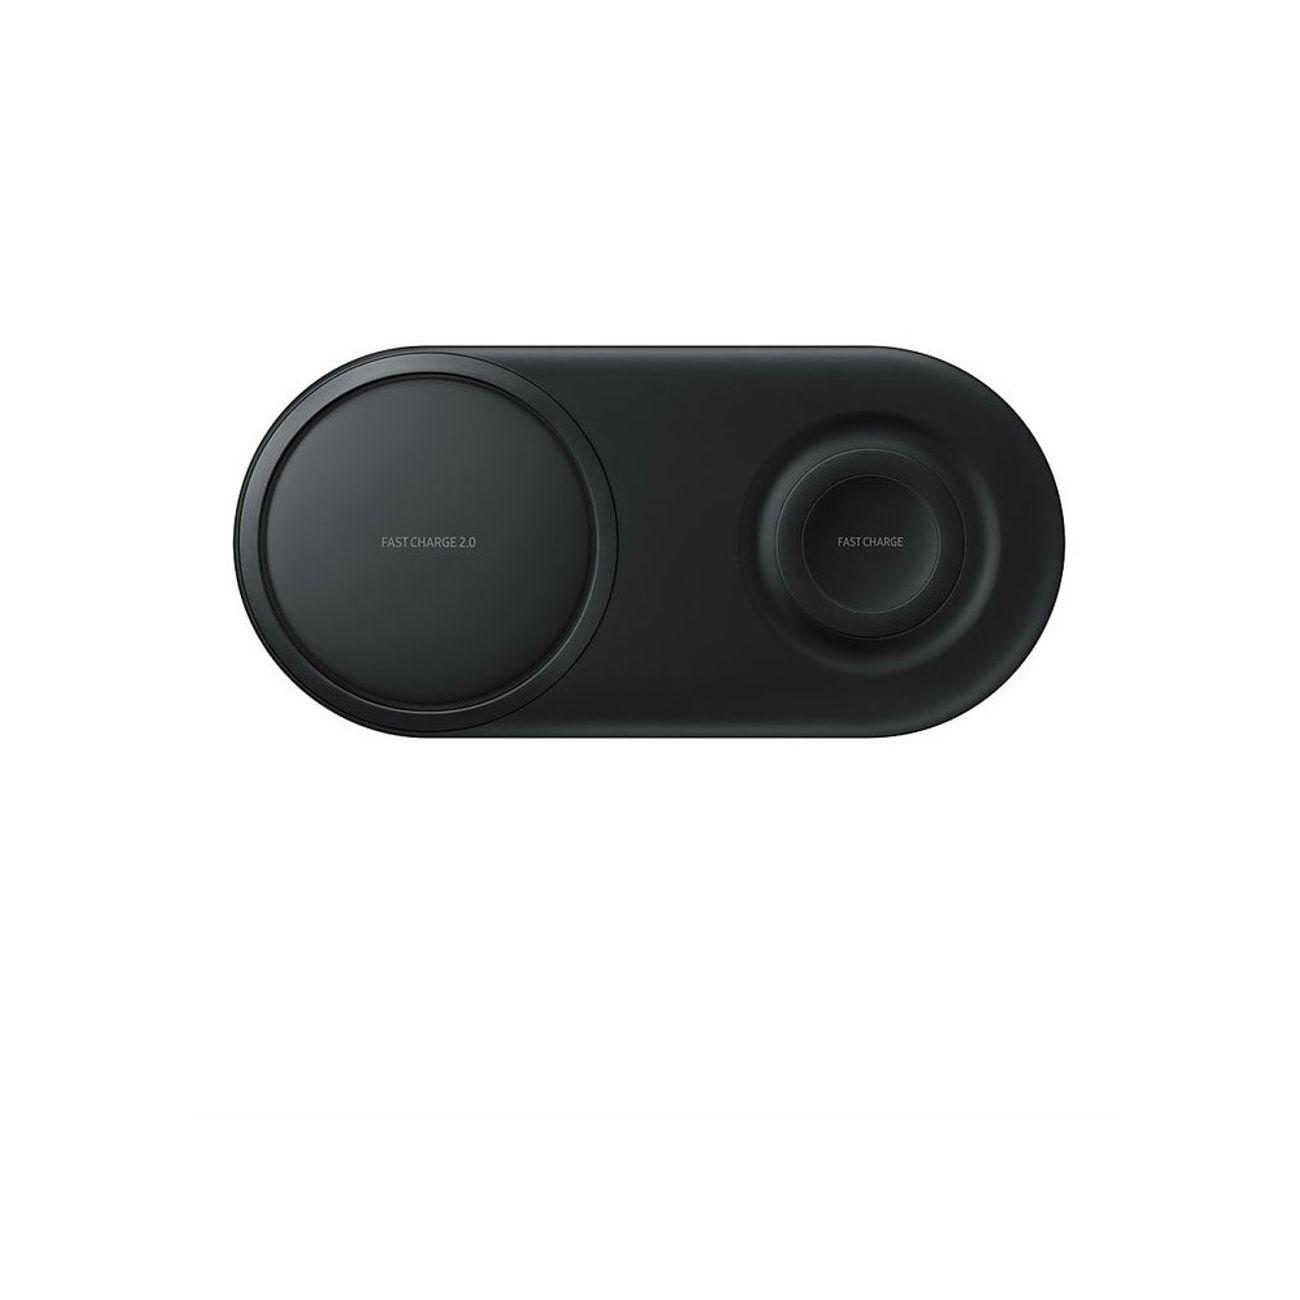 SAMSUNG Chargeur sans fil à induction duo I Samsung